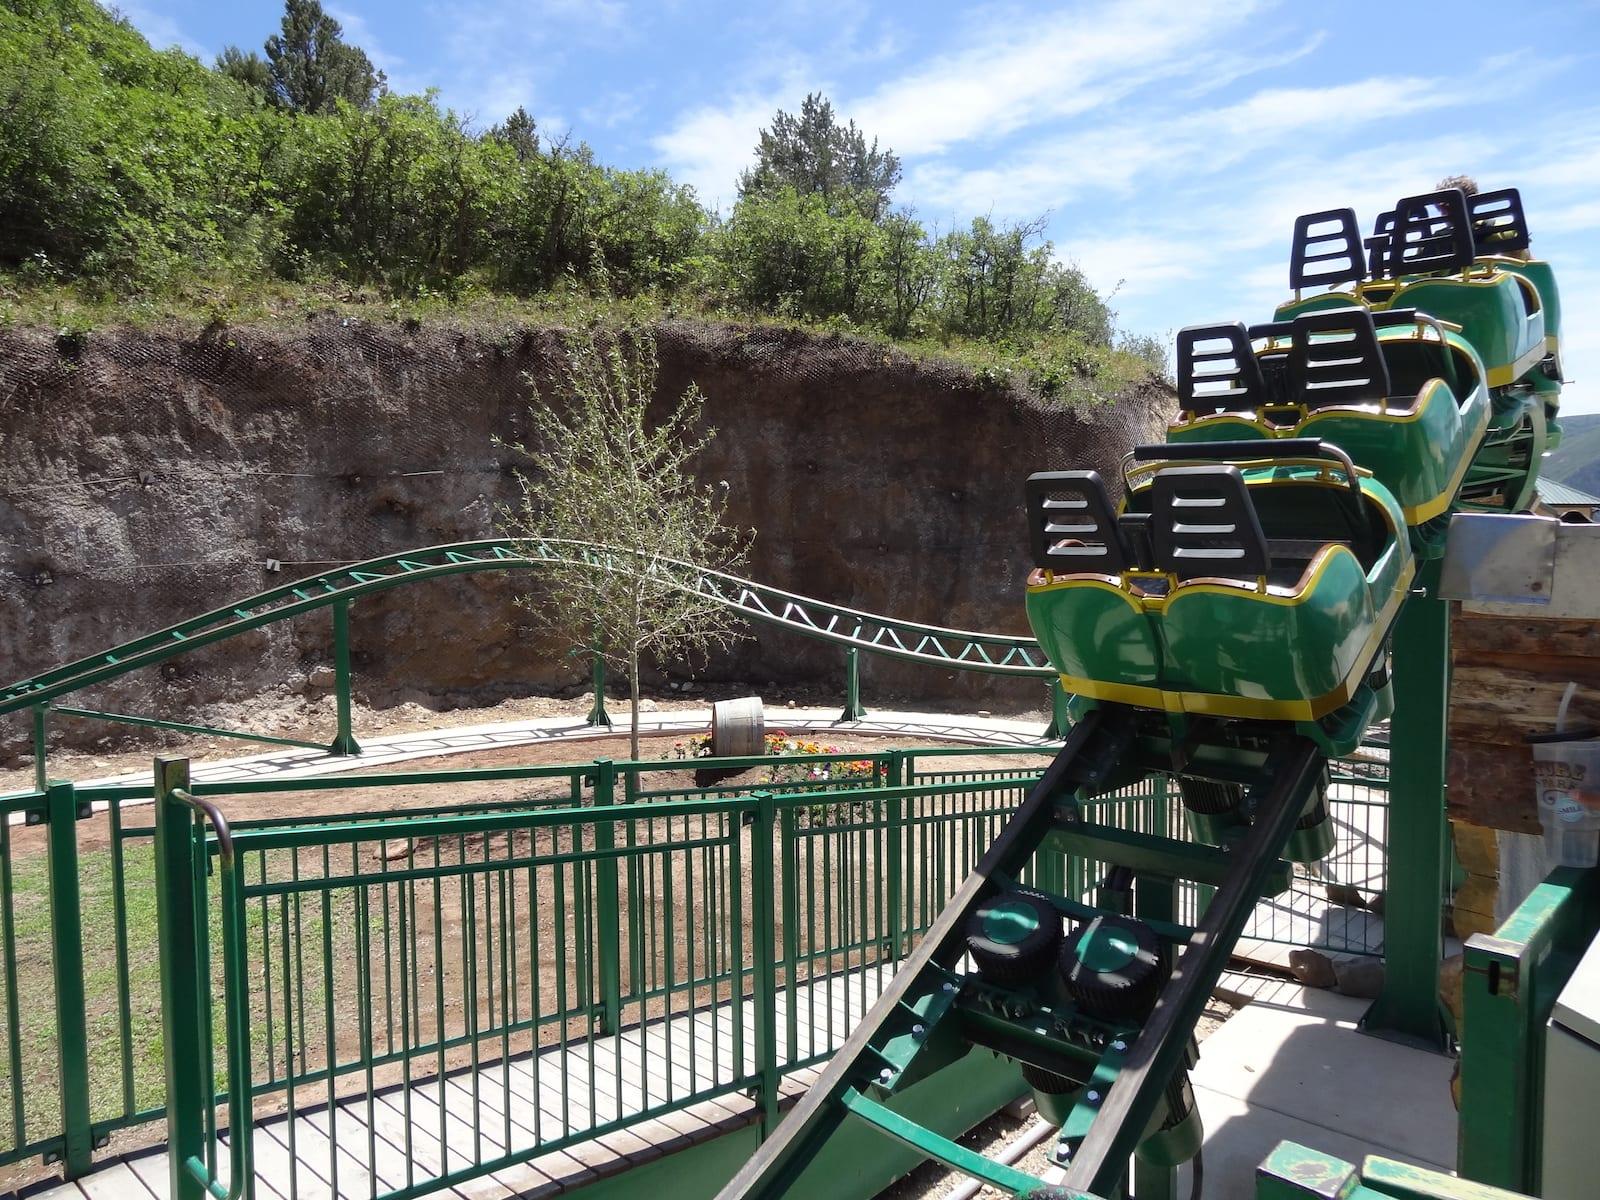 Glenwood Caverns Adventure Park Roller Coaster Ride